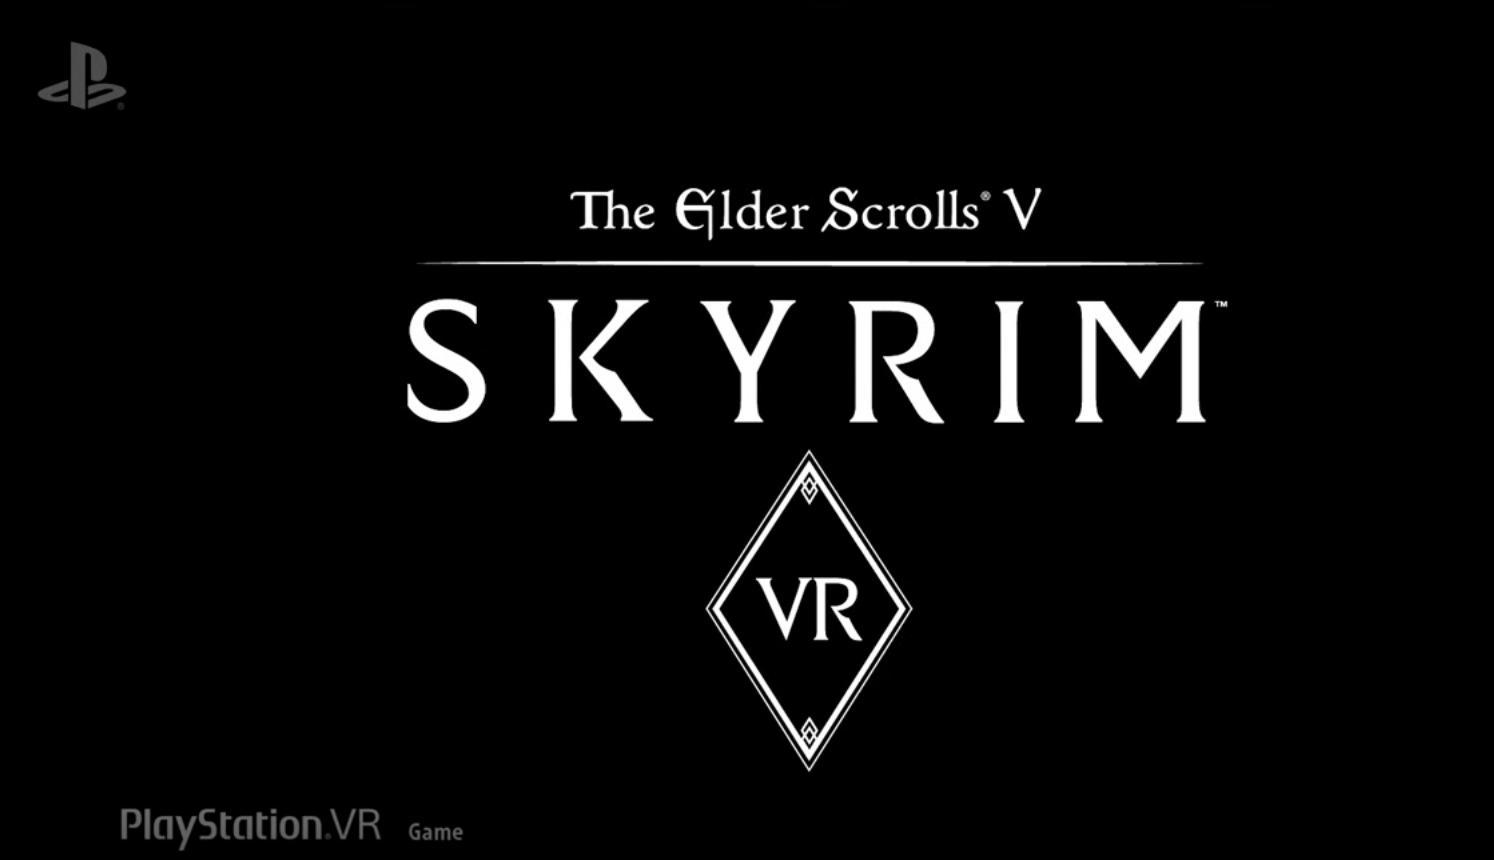 Sony Announces Skyrim VR For PlayStation VR This November